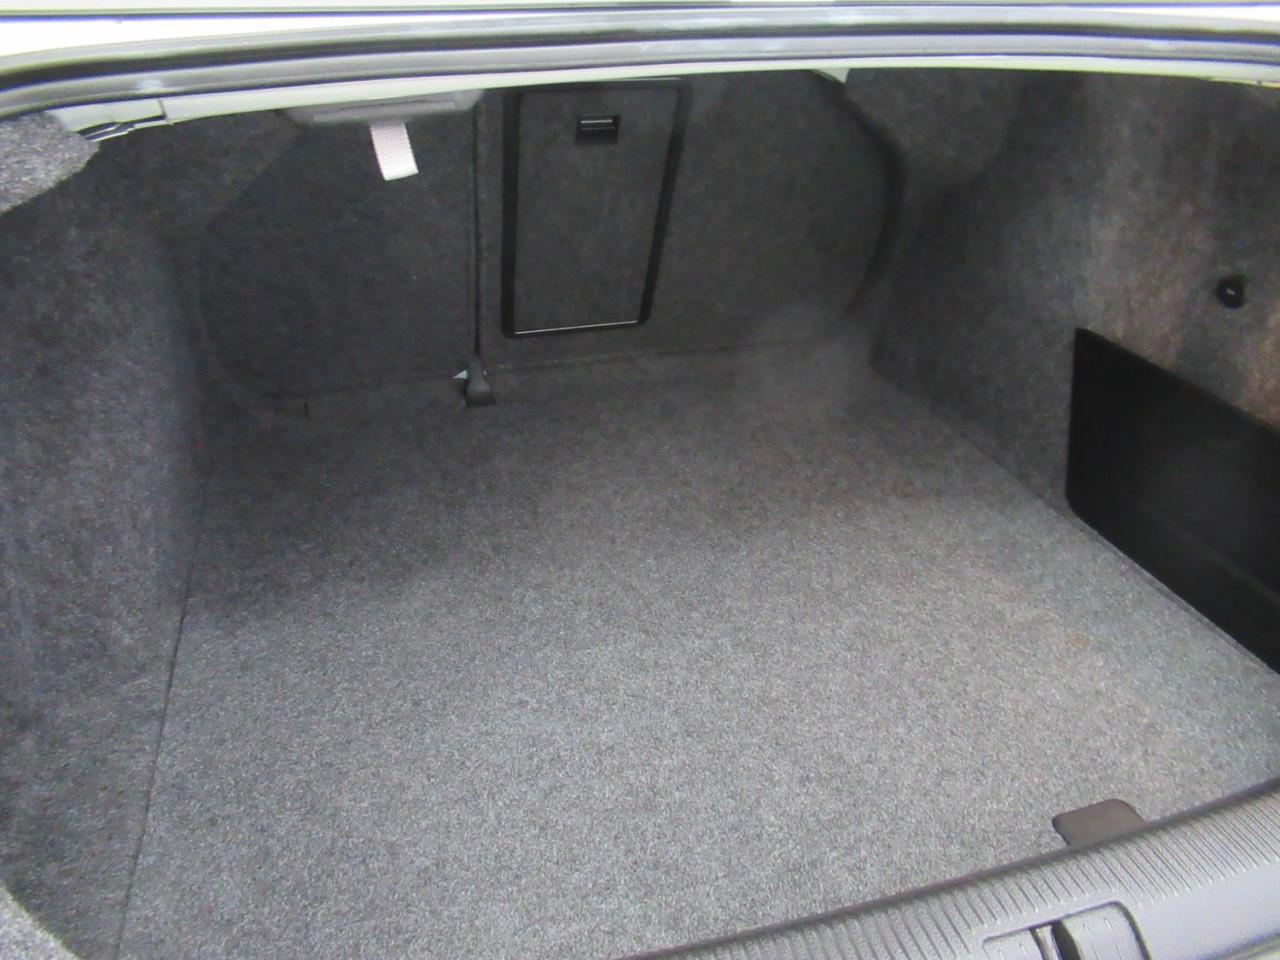 2010 Volkswagen Jetta 1KM MY10 103TDI Sedan Image 12